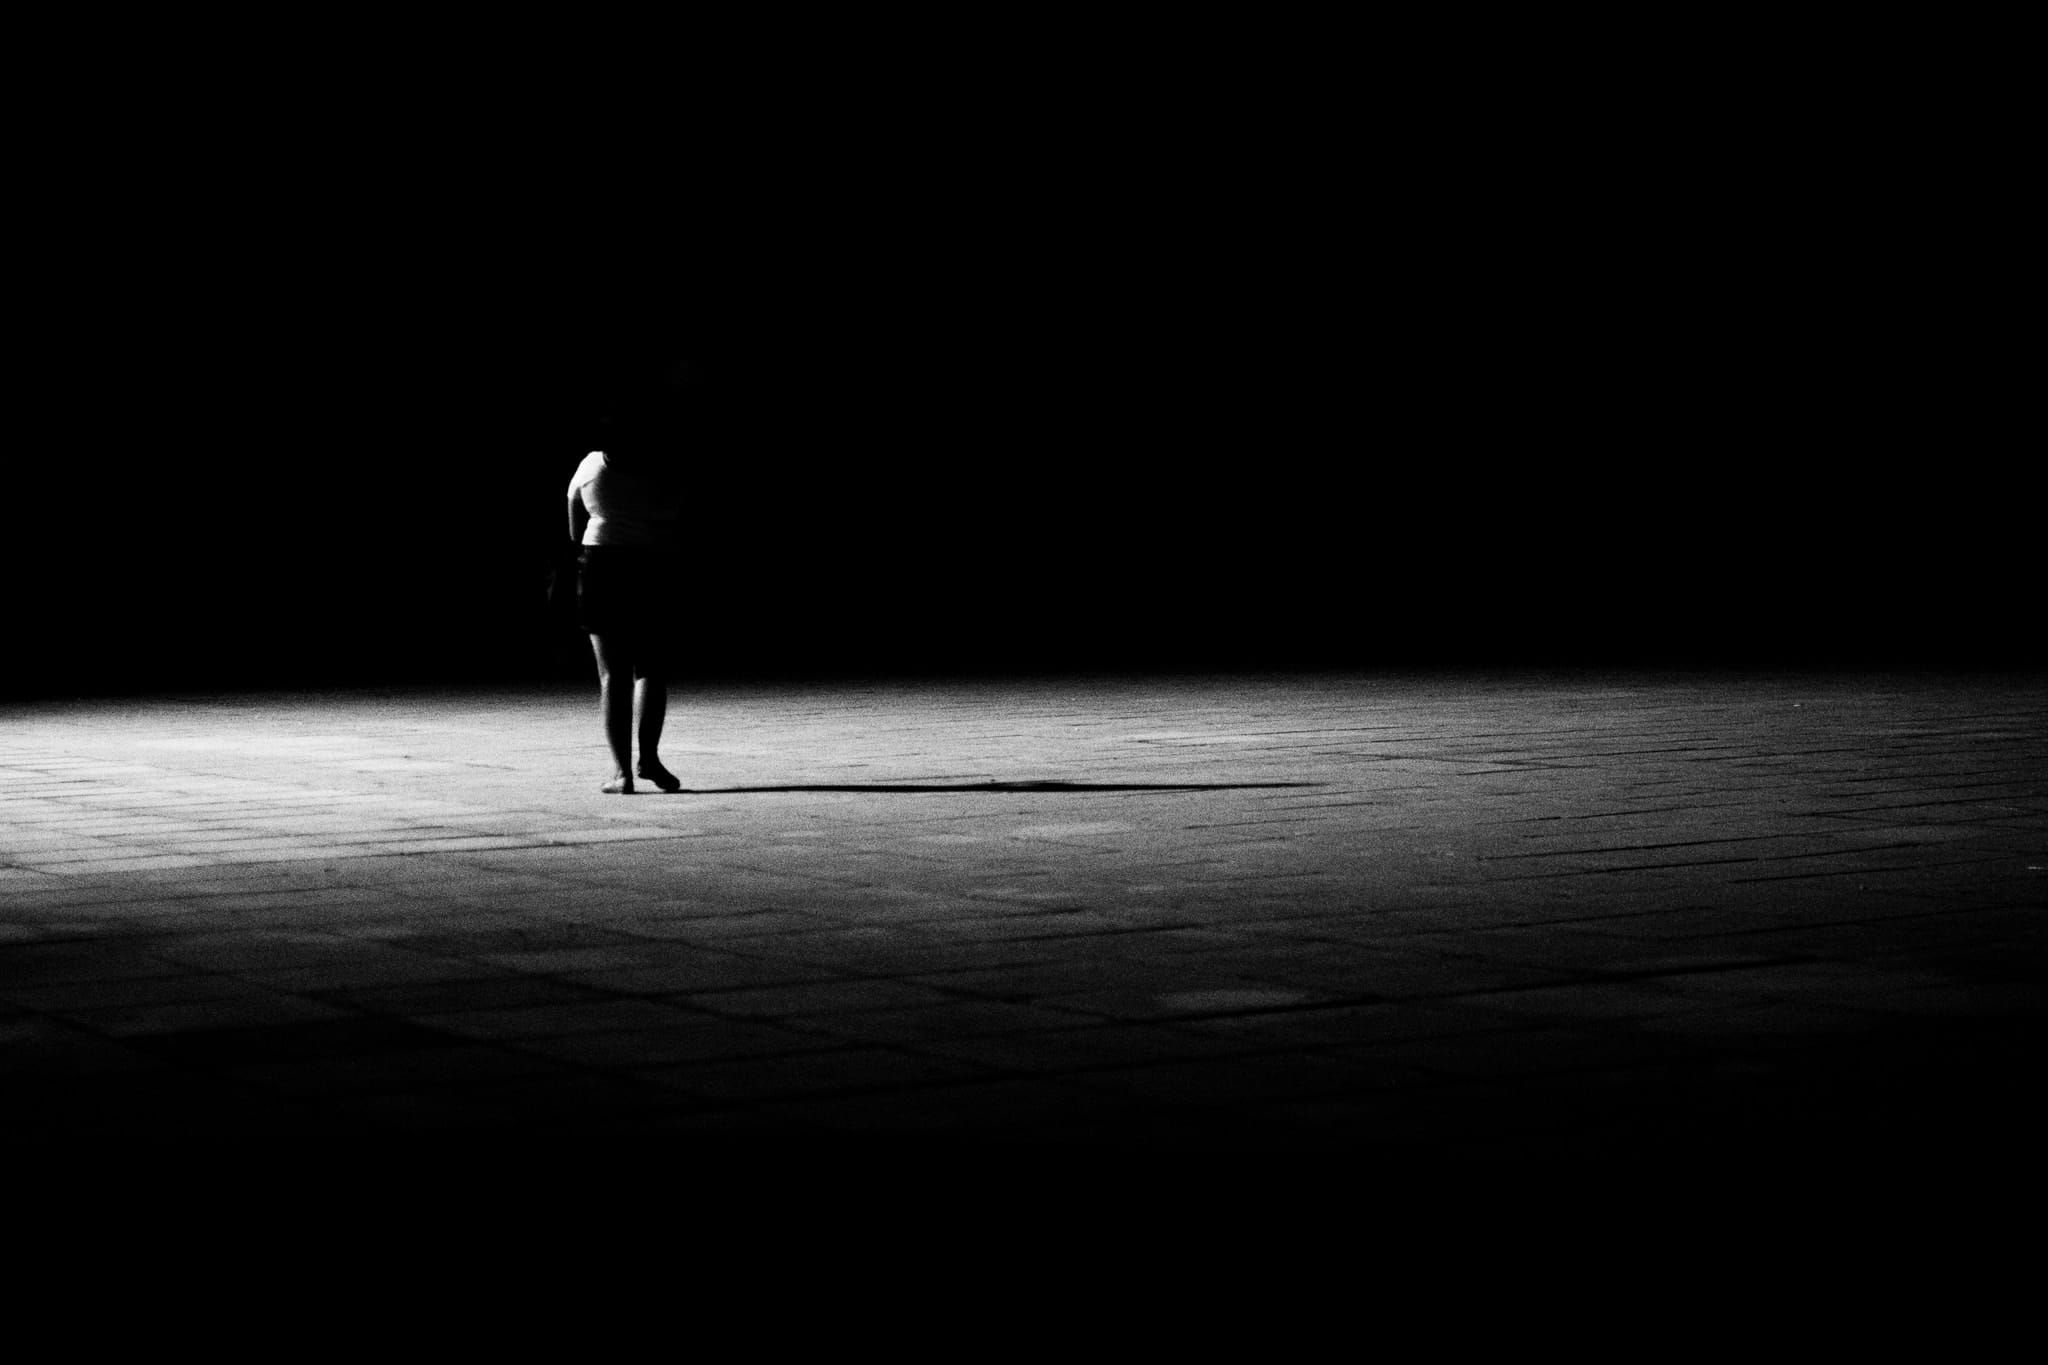 Photo by Constantinos Arvanitis